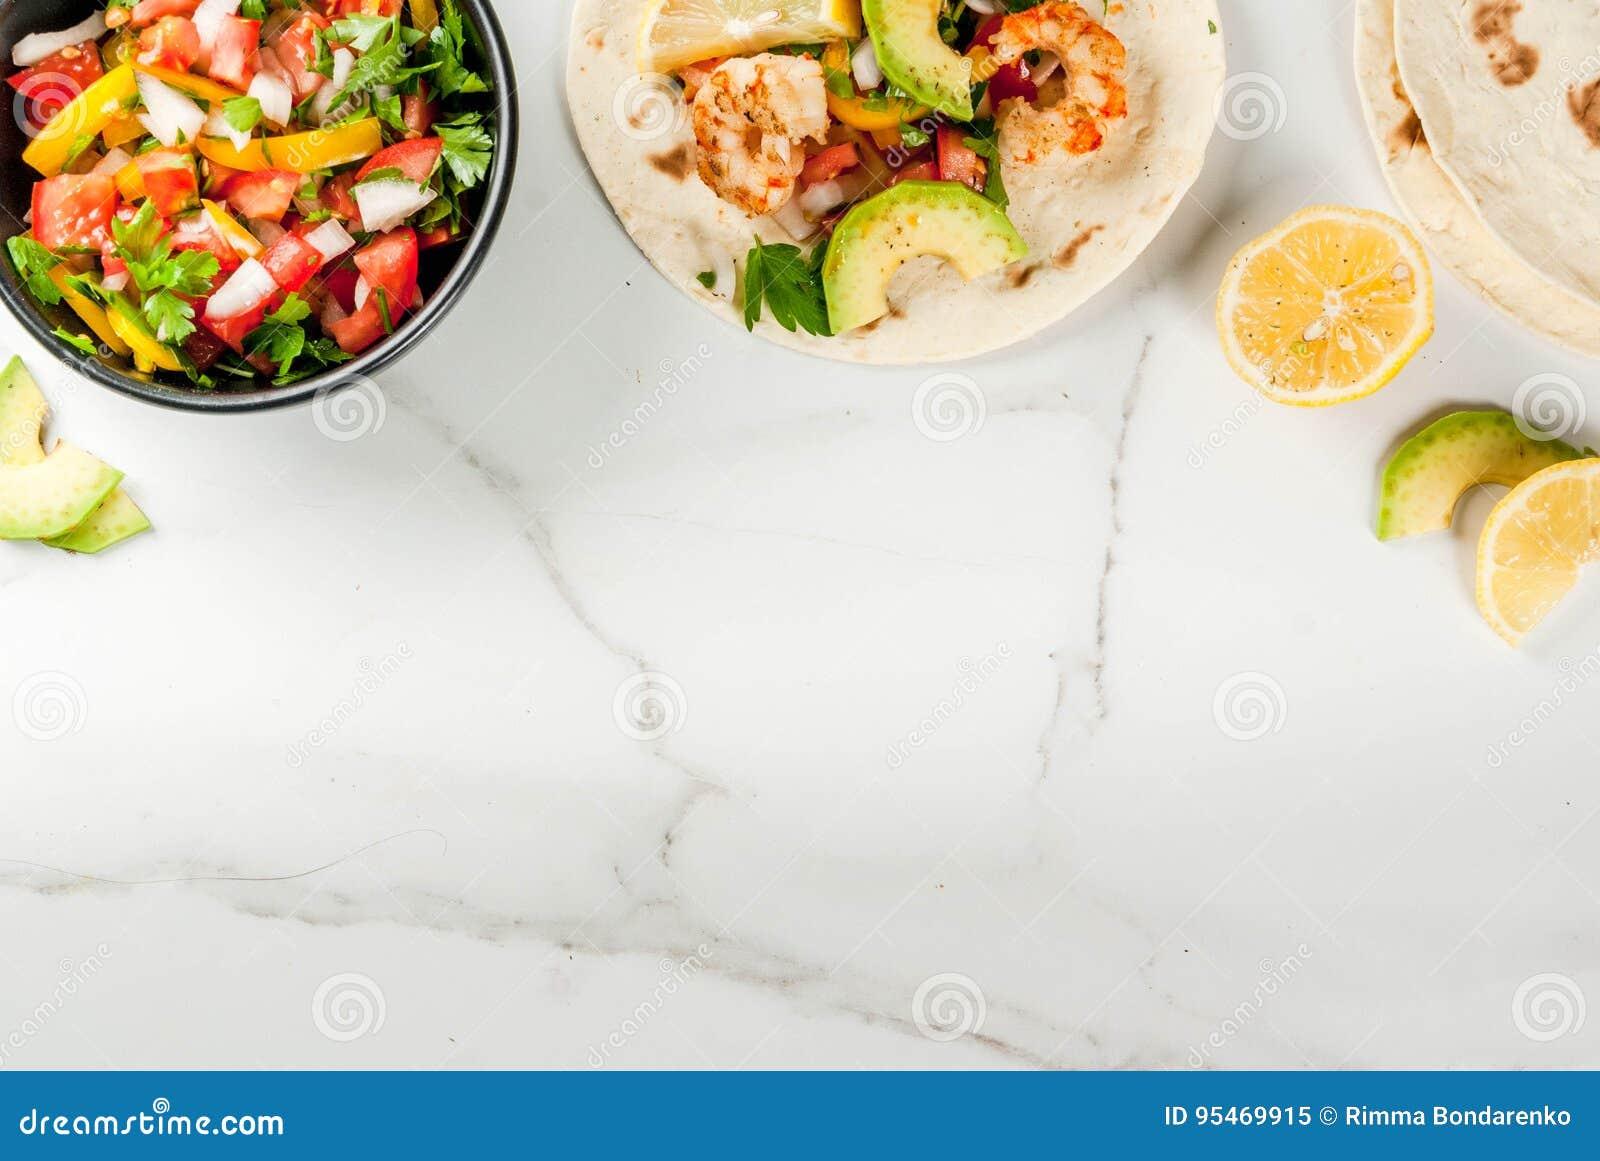 Tacos with salsa and shrimp